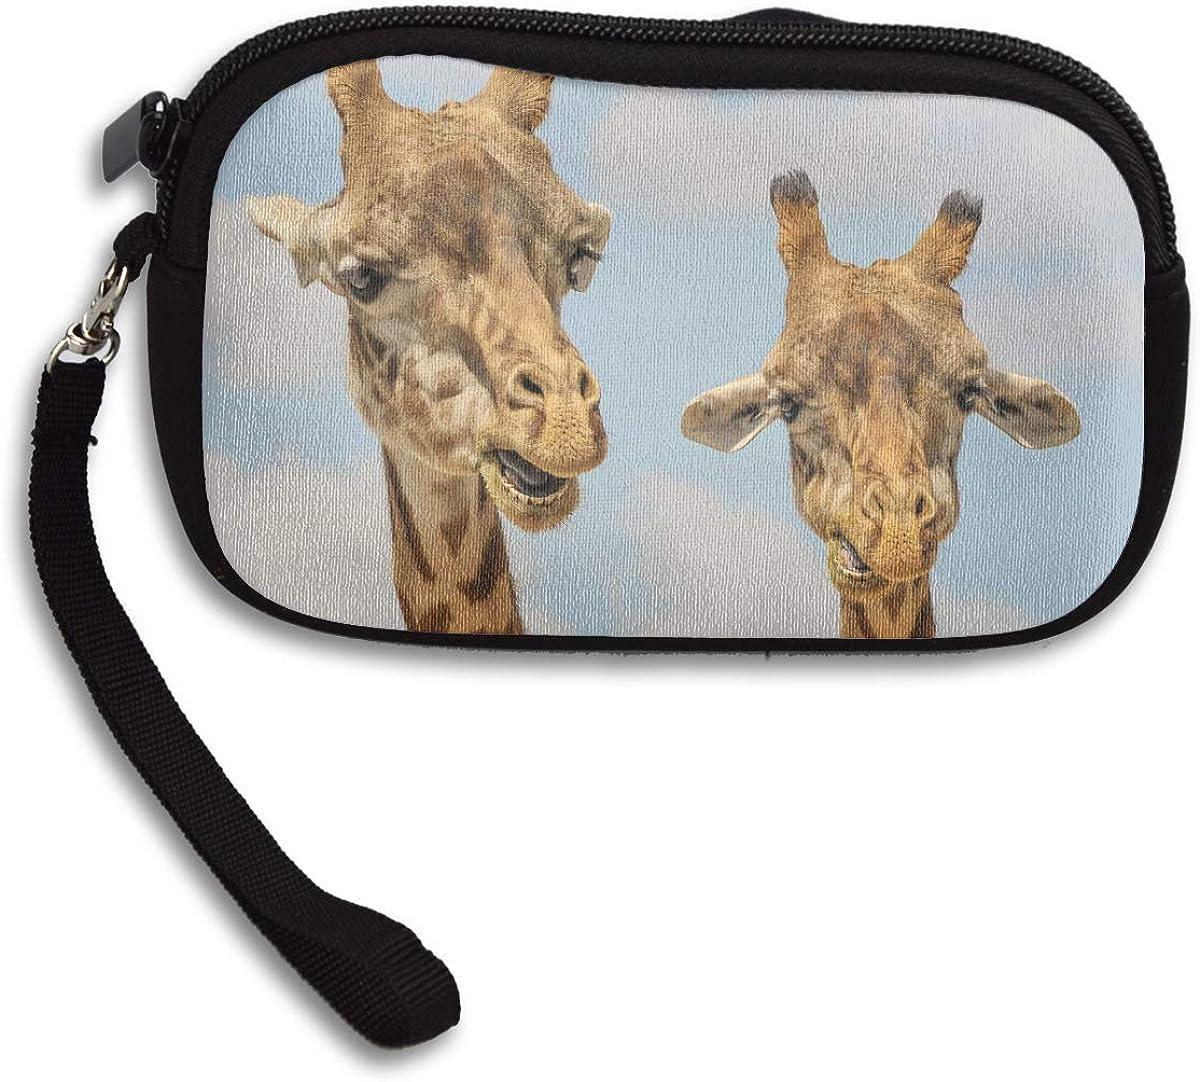 Giraffe Animals Zoo Funny Deluxe Printing Small Purse Portable Receiving Bag